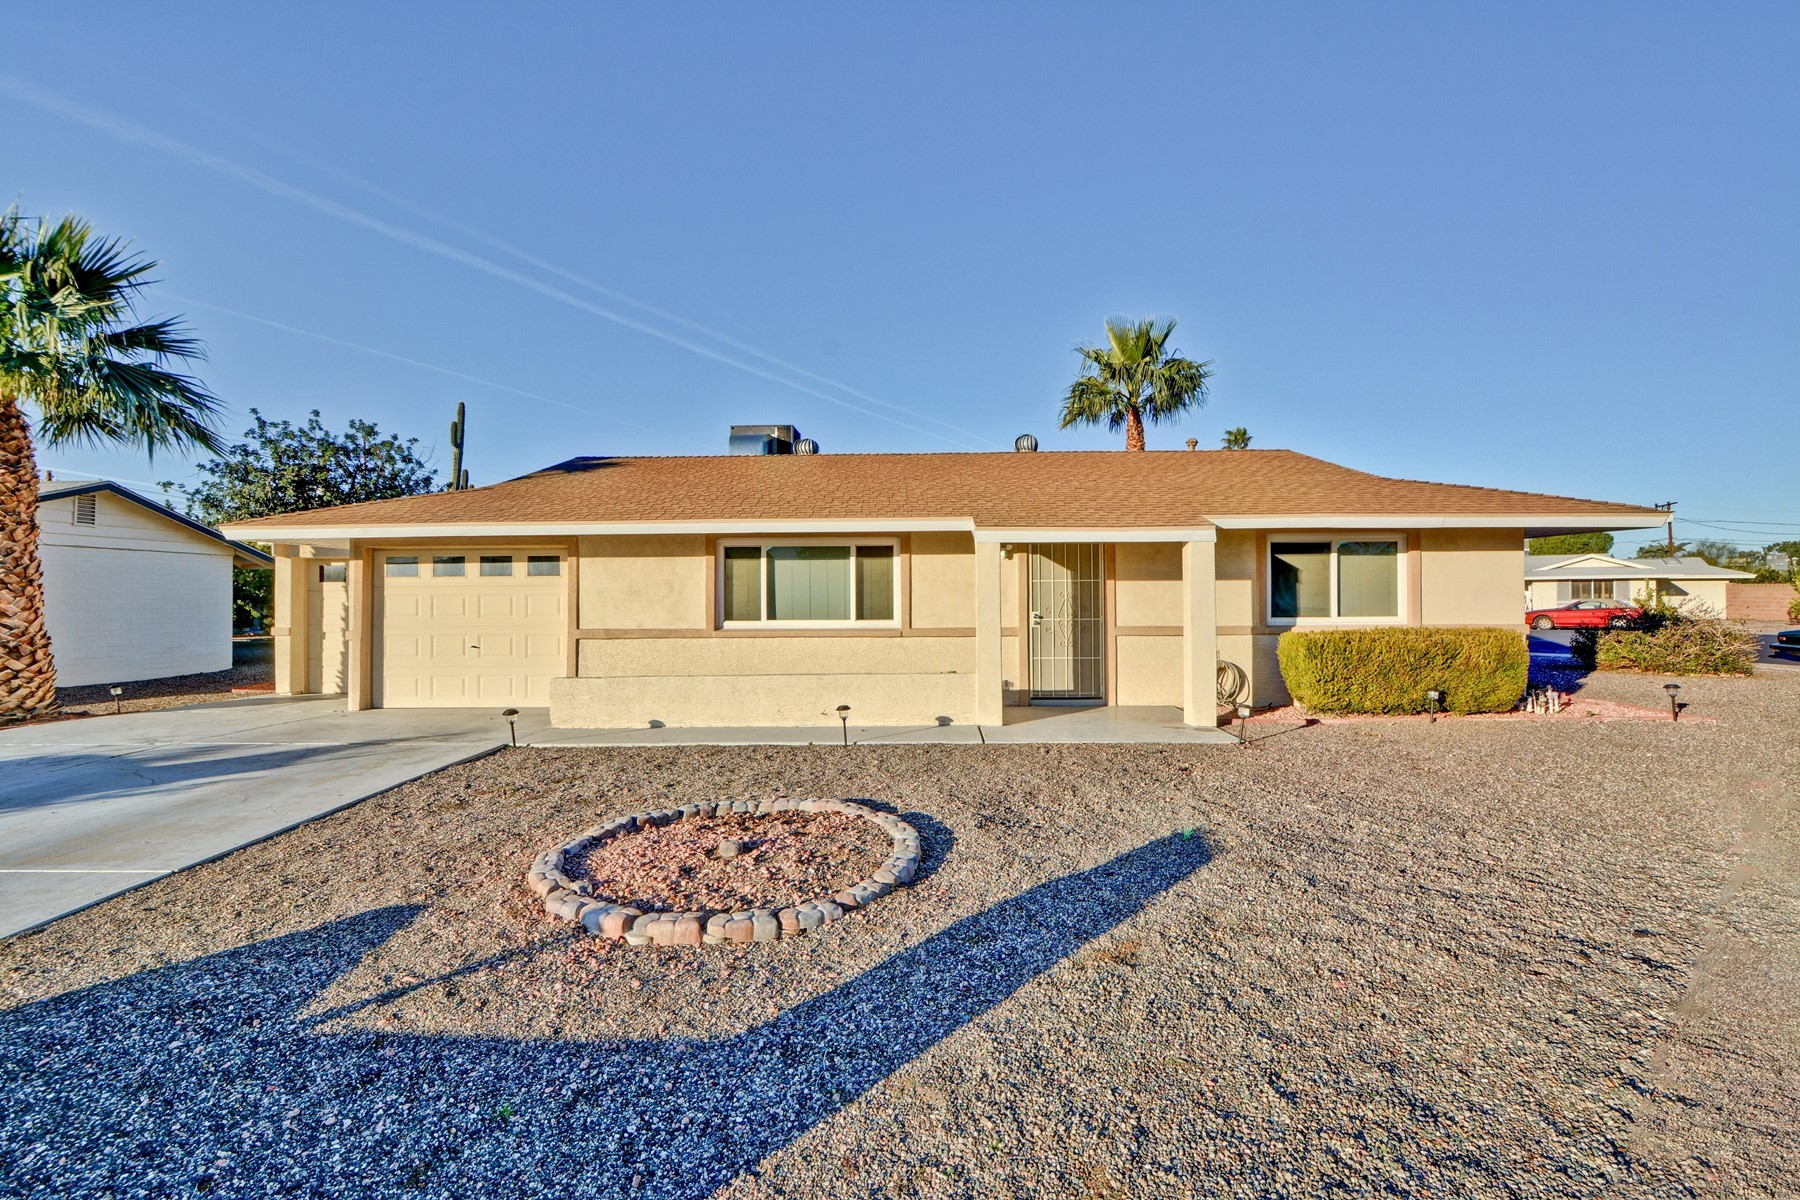 Single Family Homes for Active at Sun City 12214 N Hacienda Dr Sun City, Arizona 85351 United States